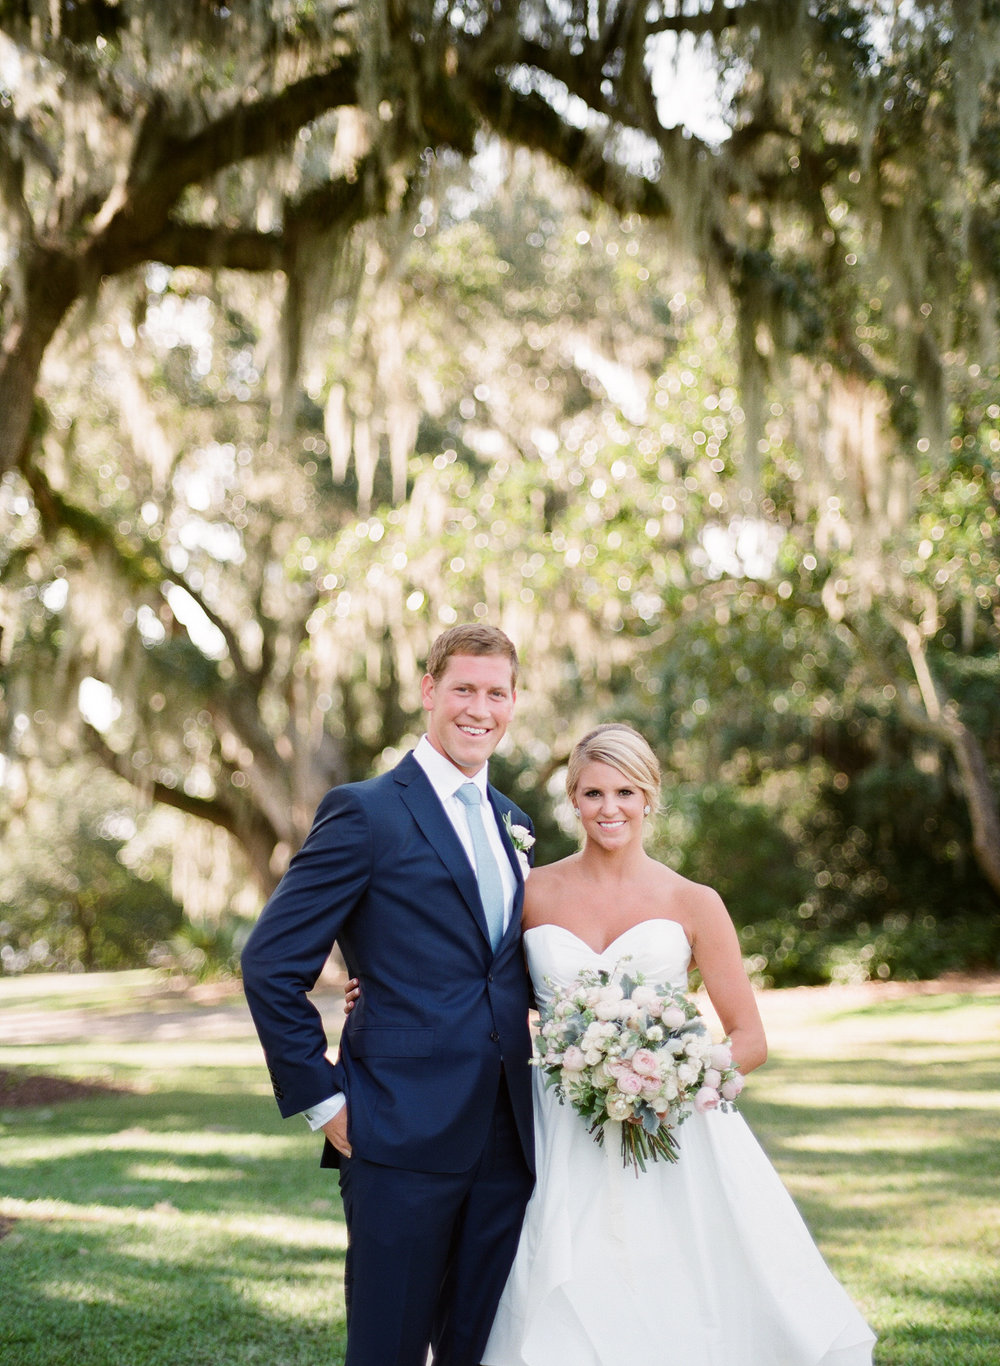 Airlie-Gardens-Wedding-25.jpg